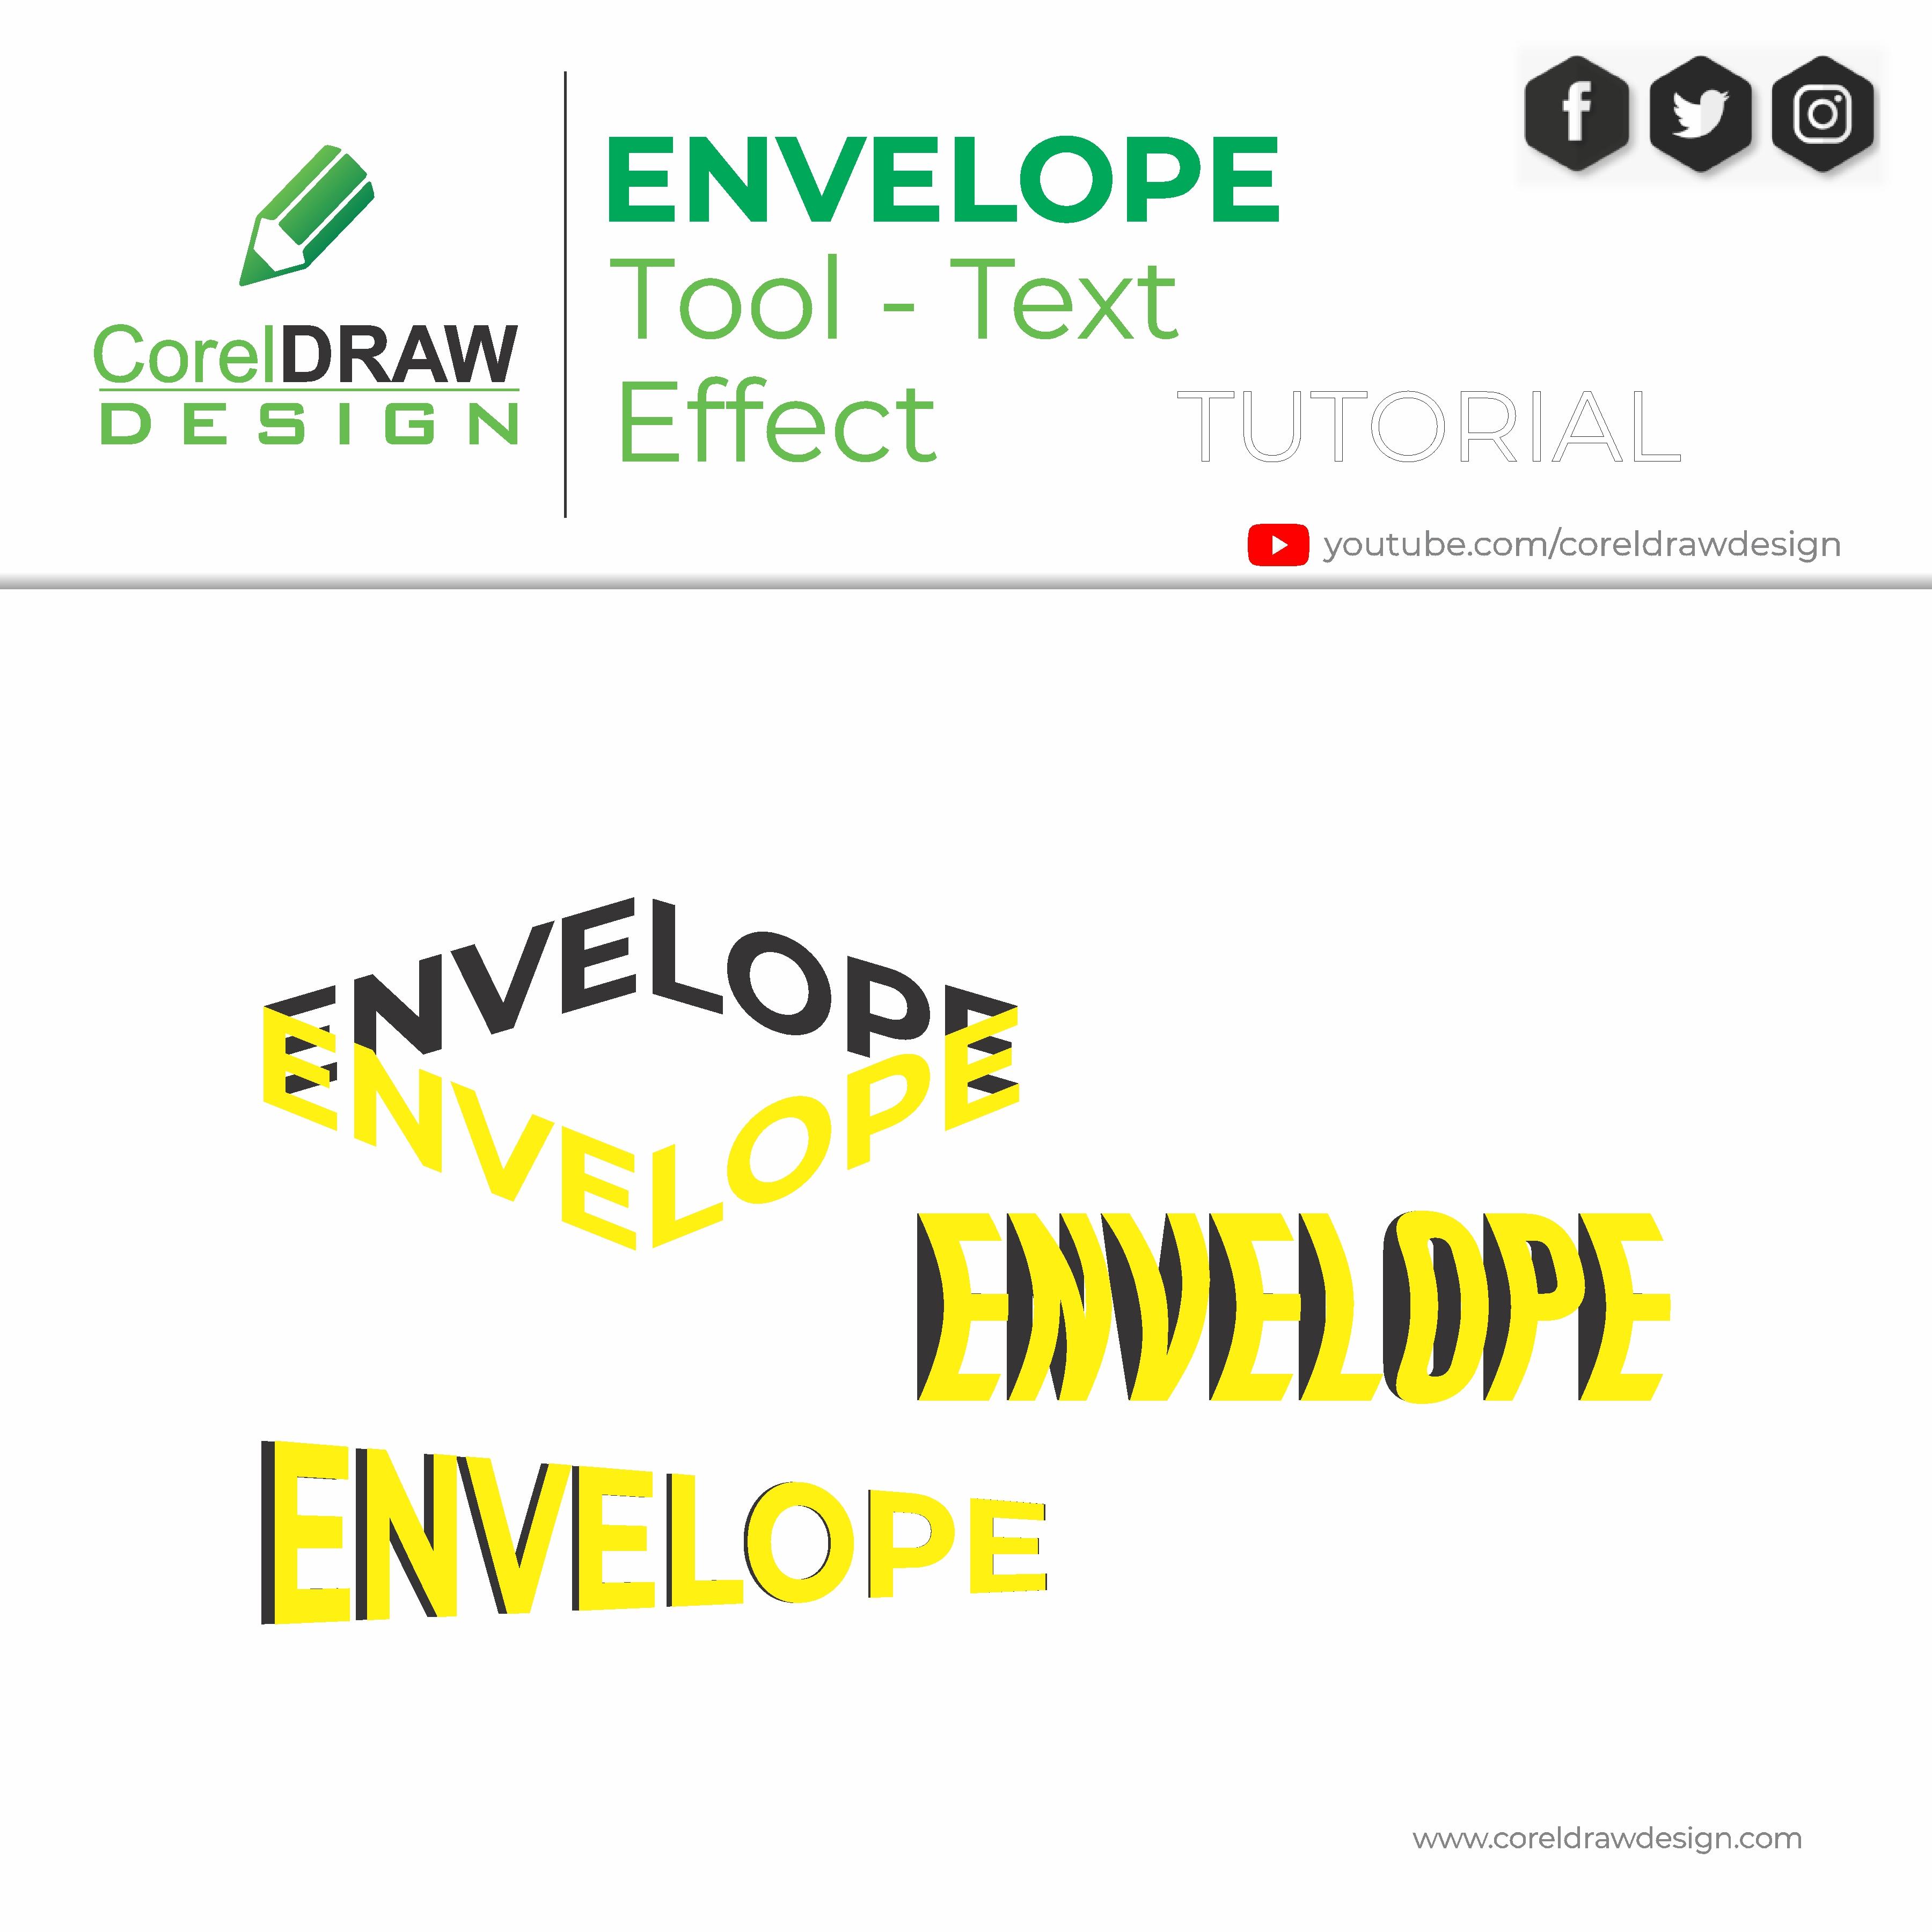 Coreldraw   Best use of Envelope tool   Digital Graphics   Tutorial   Coreldraw for Beginners